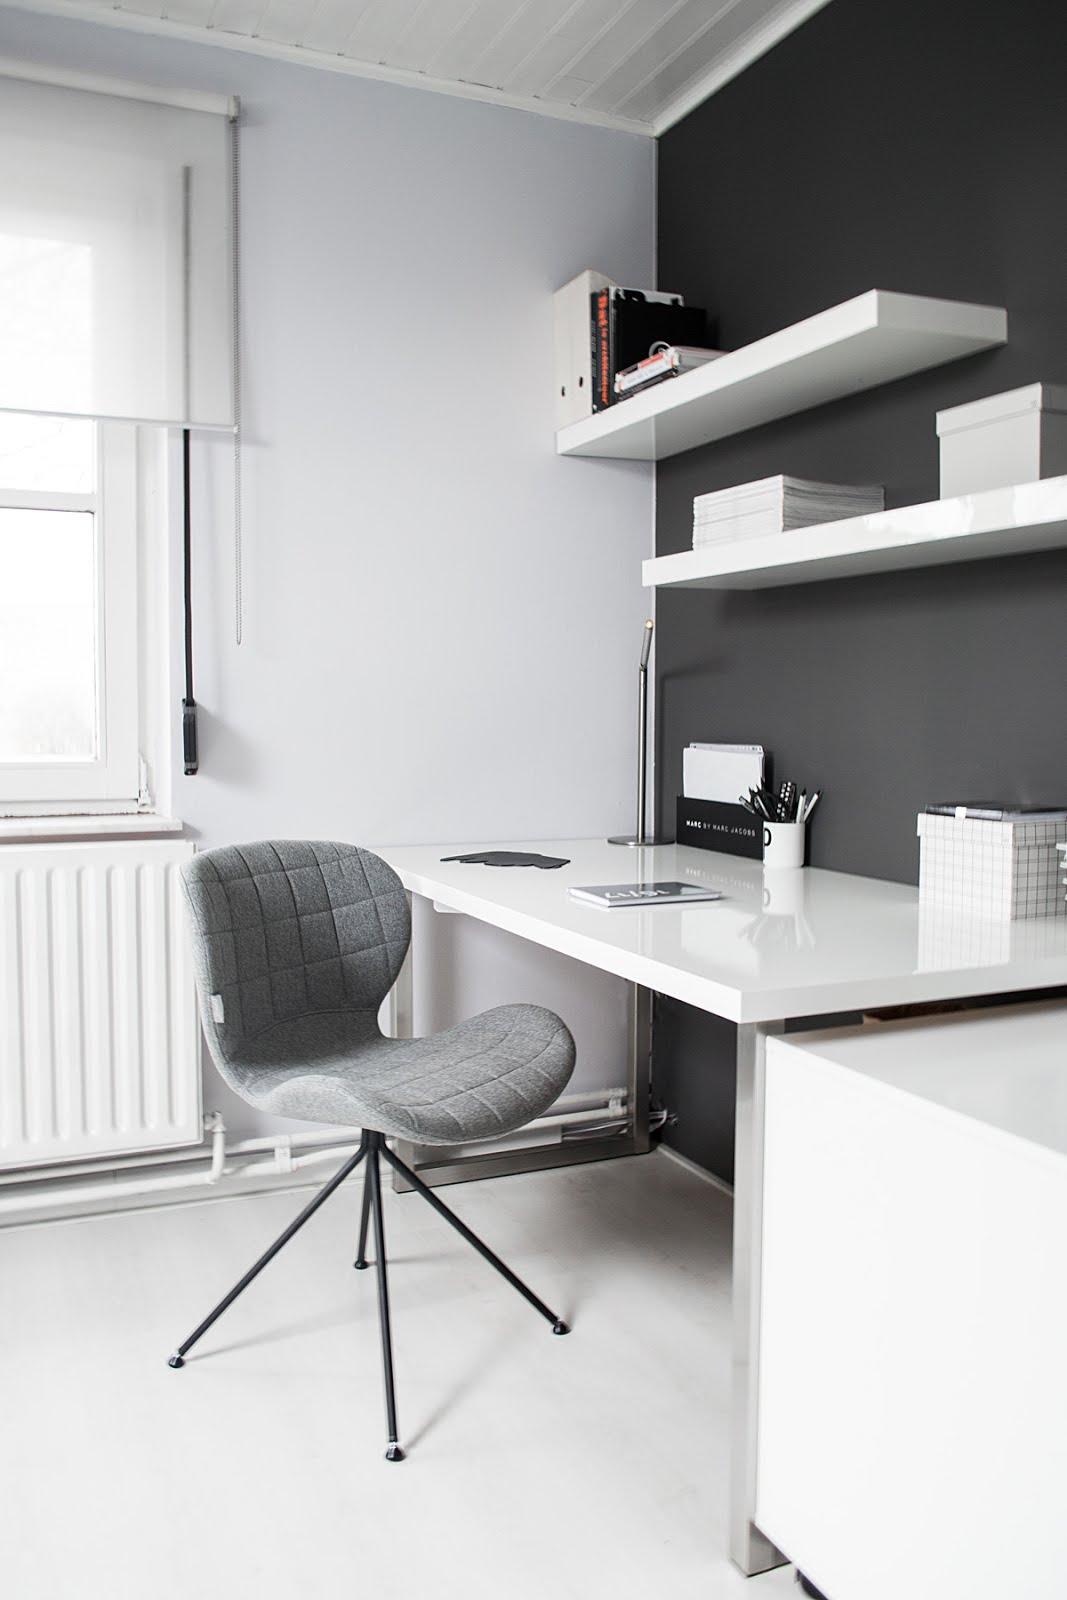 Zuiver, omg chair, minster design, minimal interior, black white, interior design, vitra, elephant mouse pad, ikea lack